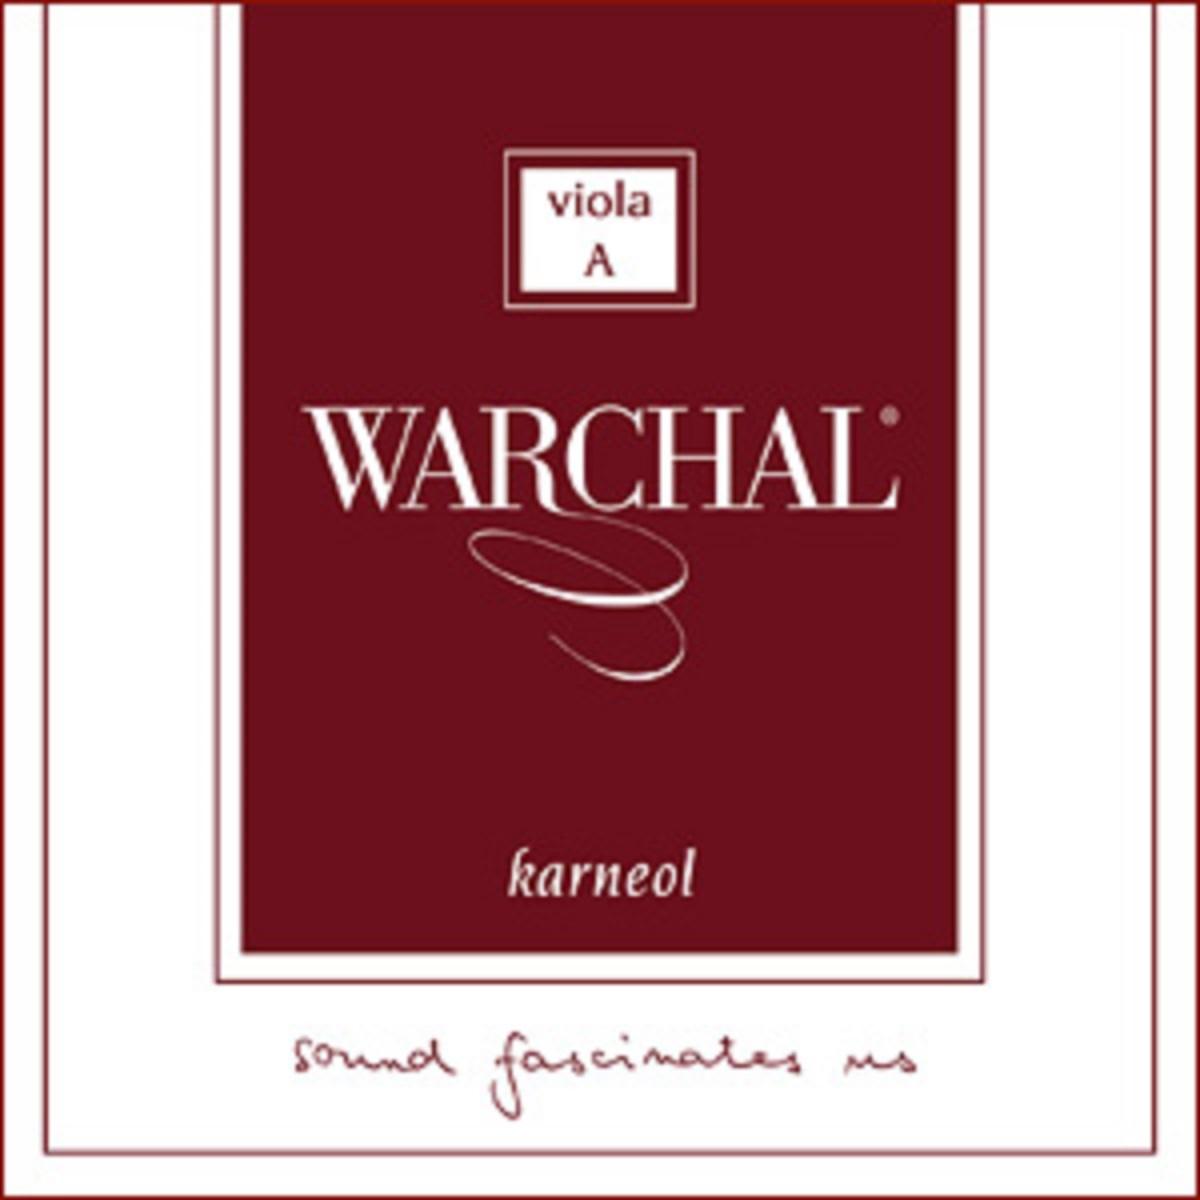 Комплект струн для альта Warchal Karneol 510S